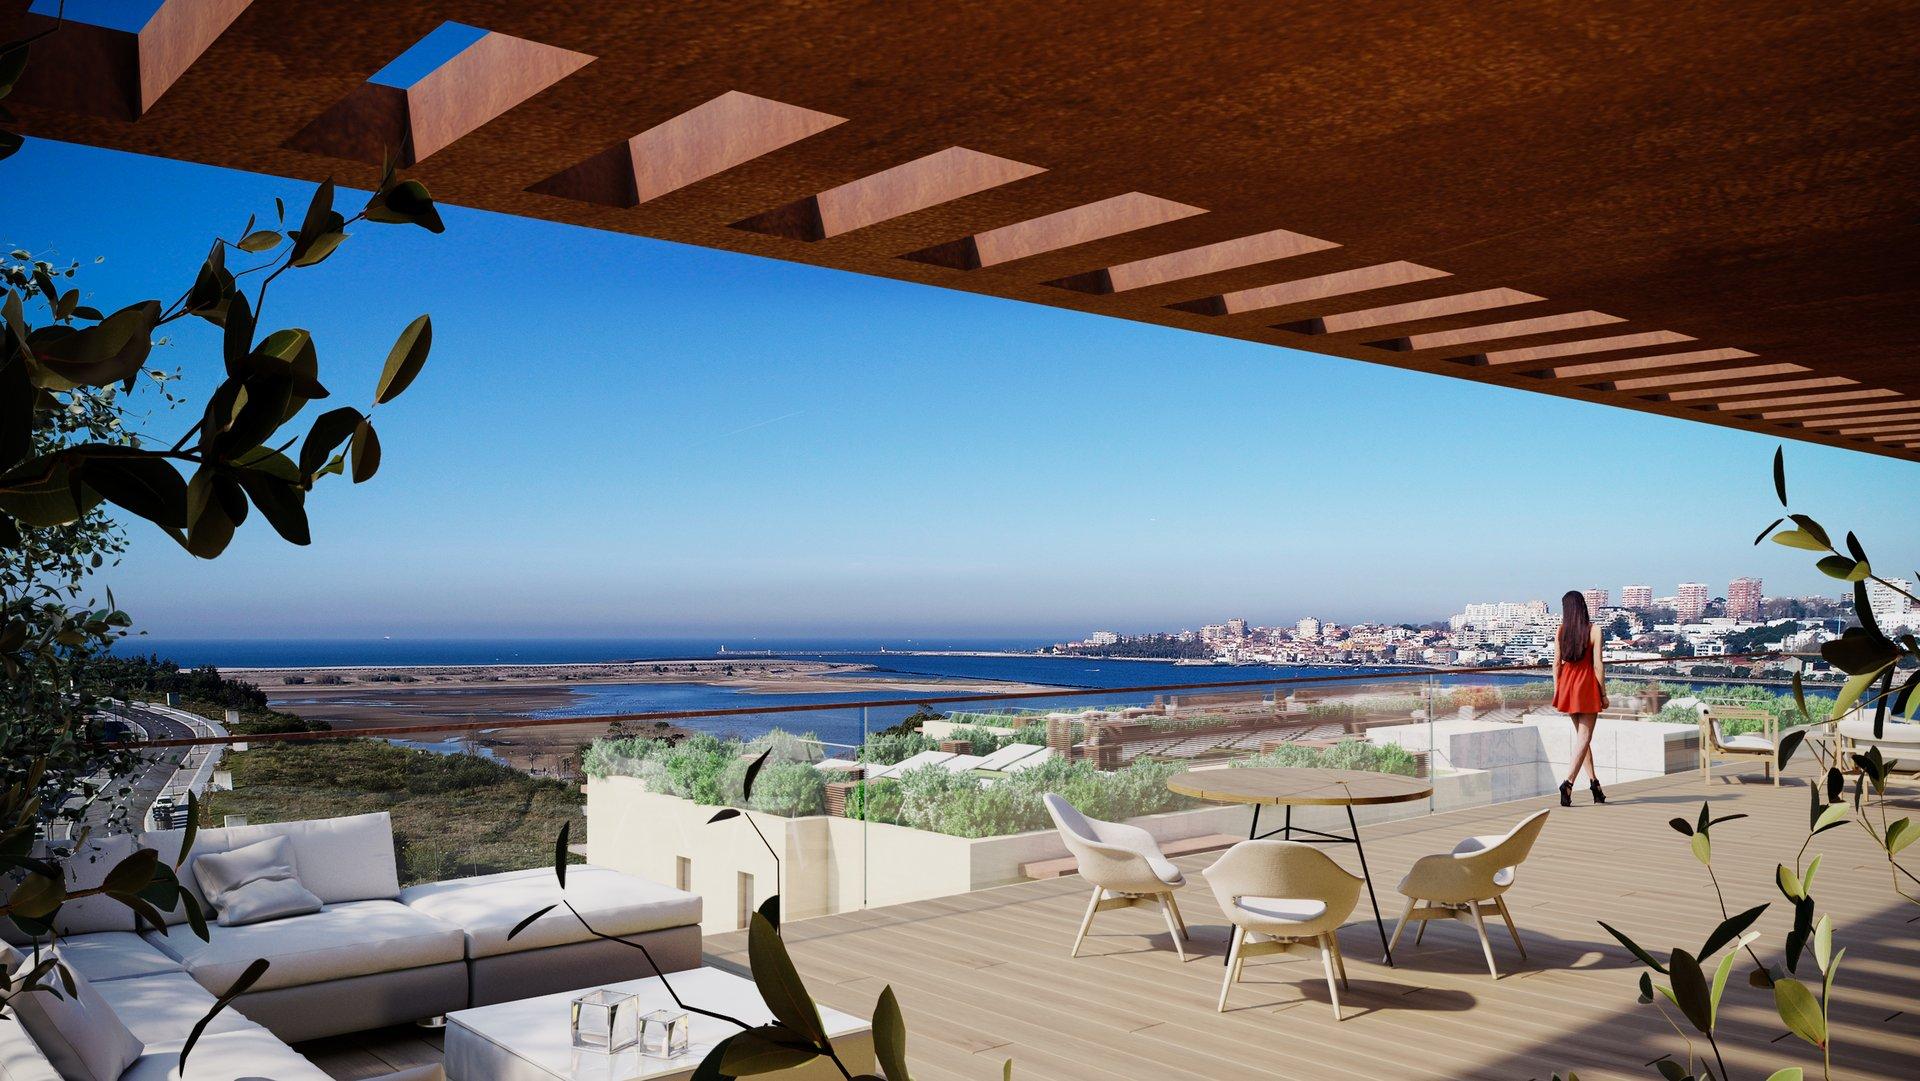 3 Bedroom Apartment Vila Nova de Gaia, Porto Ref: ASA215E